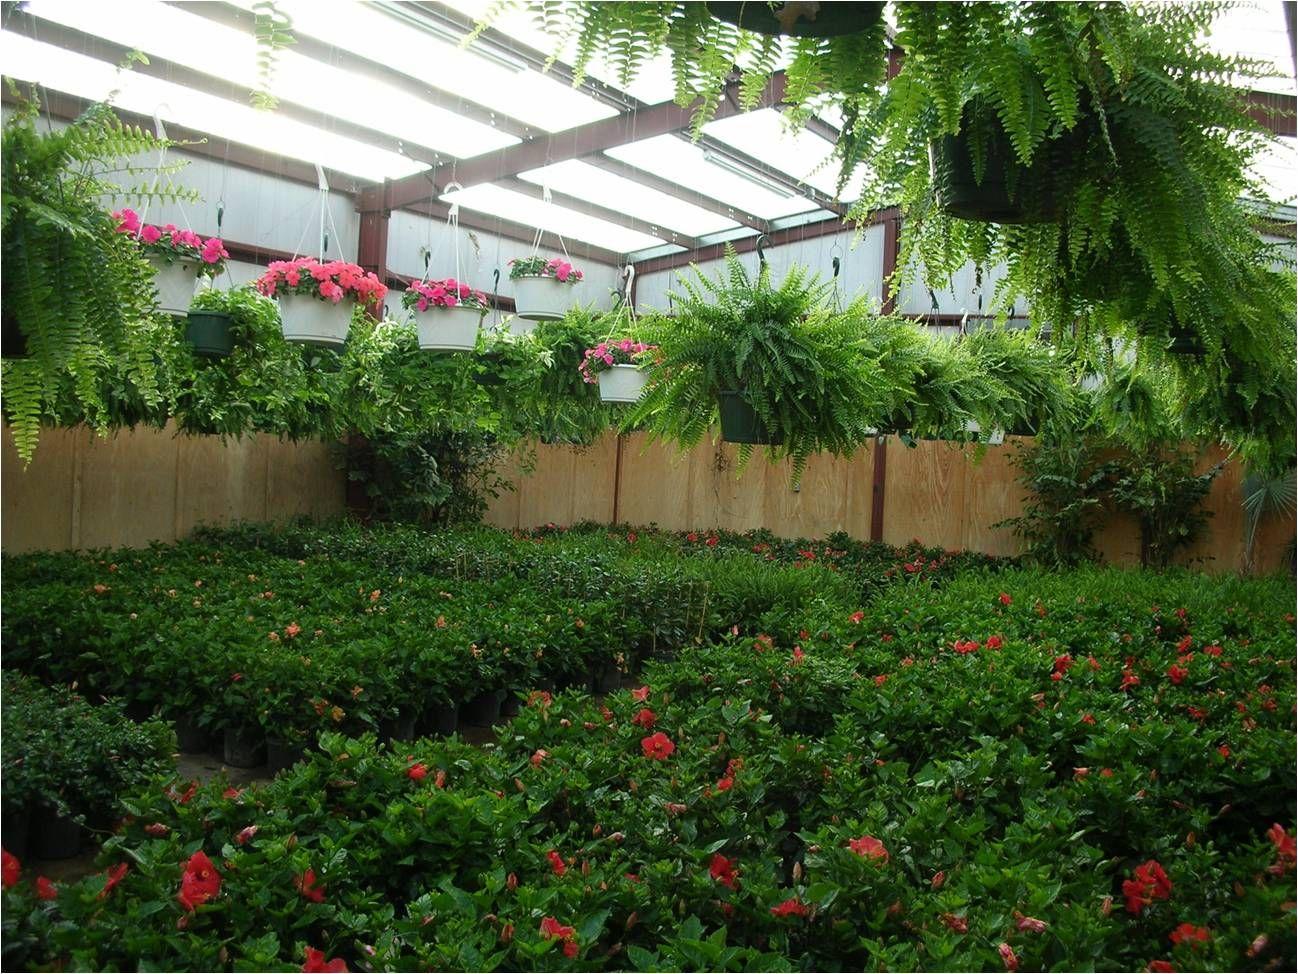 The greenhouse dallas tx - Perennials Cristina S Garden Center Dallas Tx 972 599 2033 Annuals